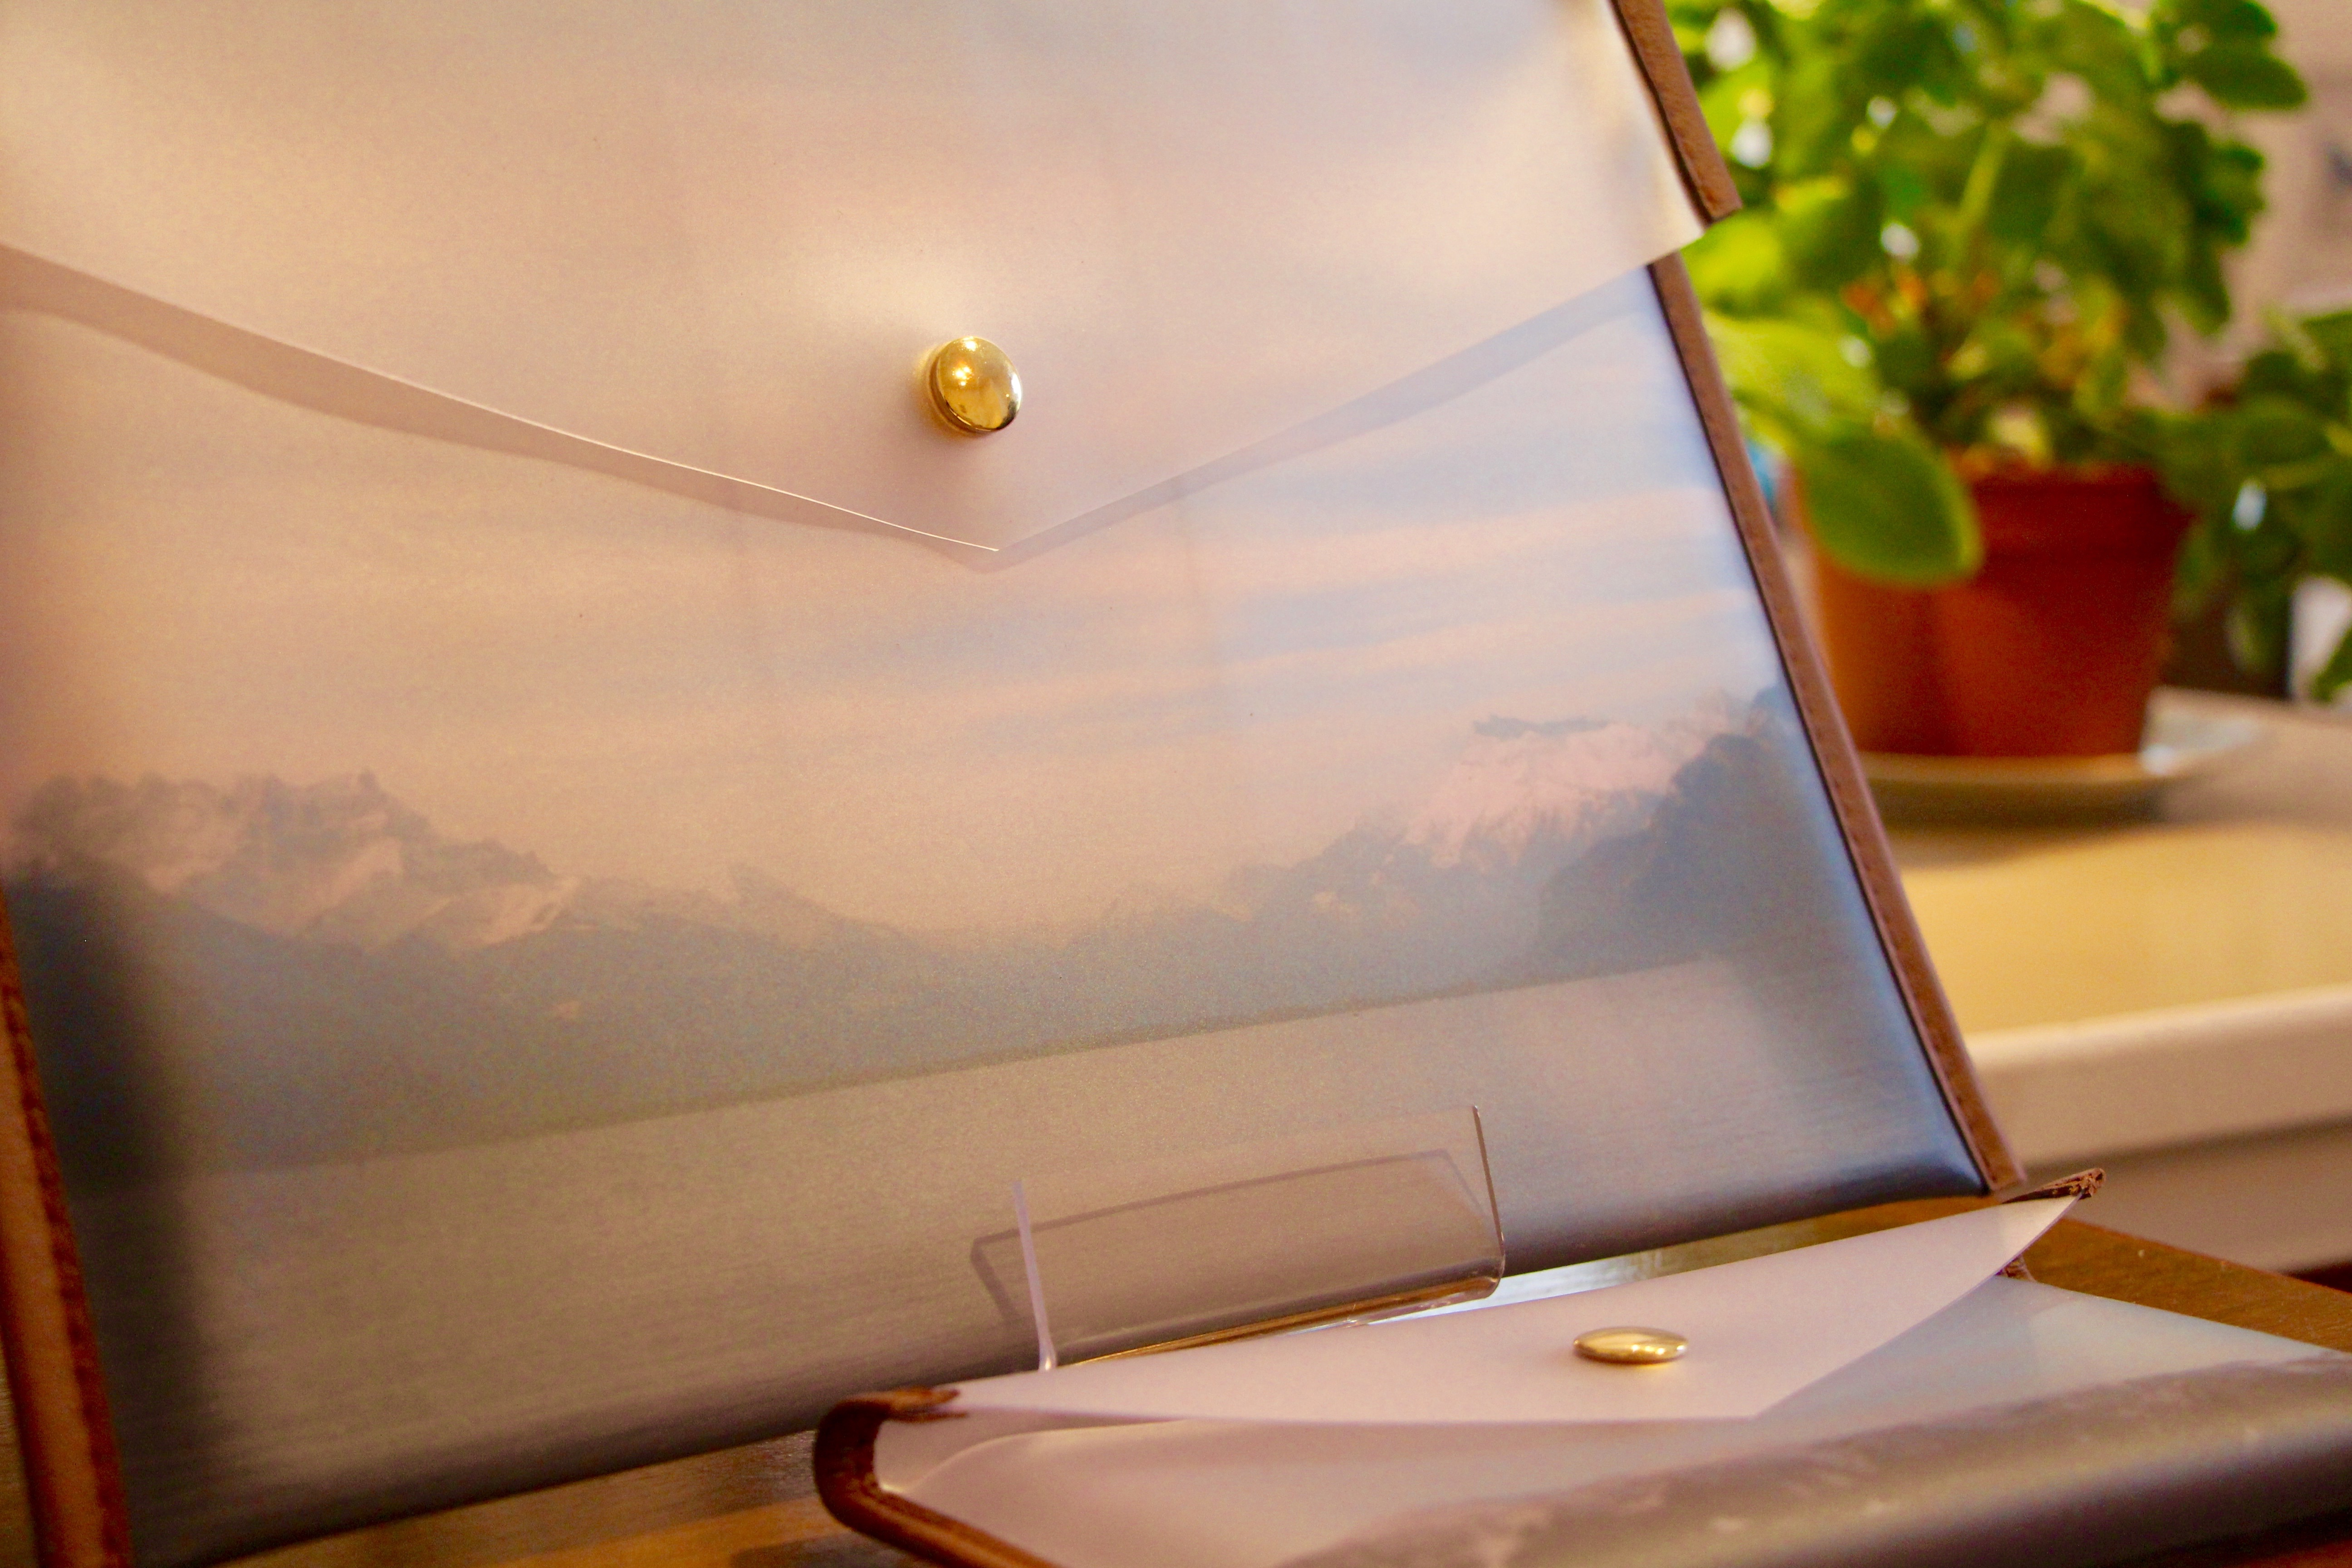 Pochettes translucides avec paysage © E.Rousak